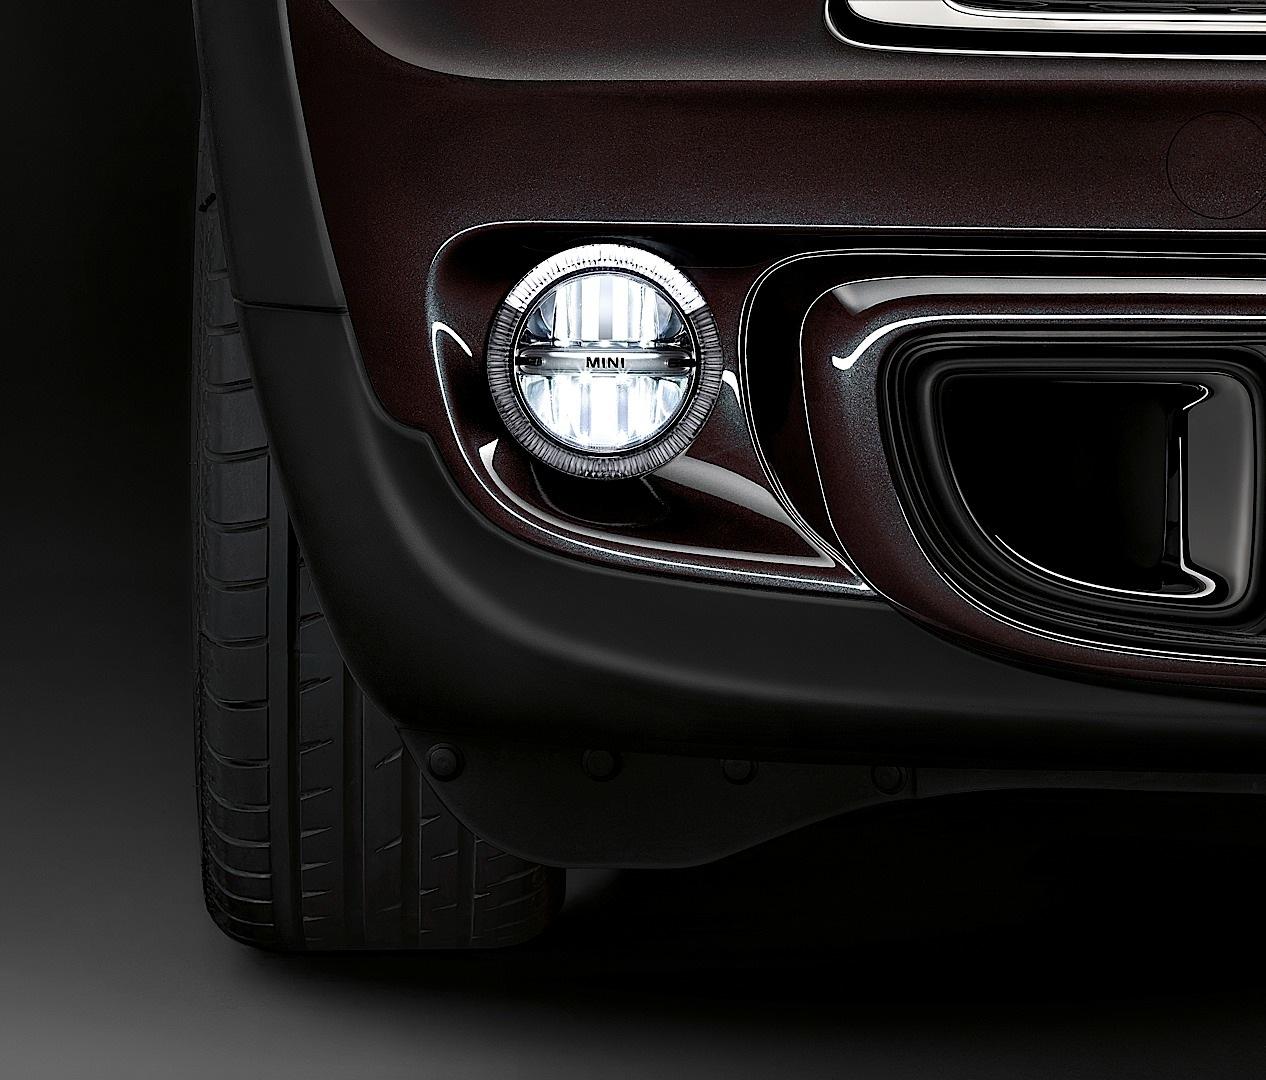 mini will introduce retrofit xenon headlamps at 2013 iaa. Black Bedroom Furniture Sets. Home Design Ideas